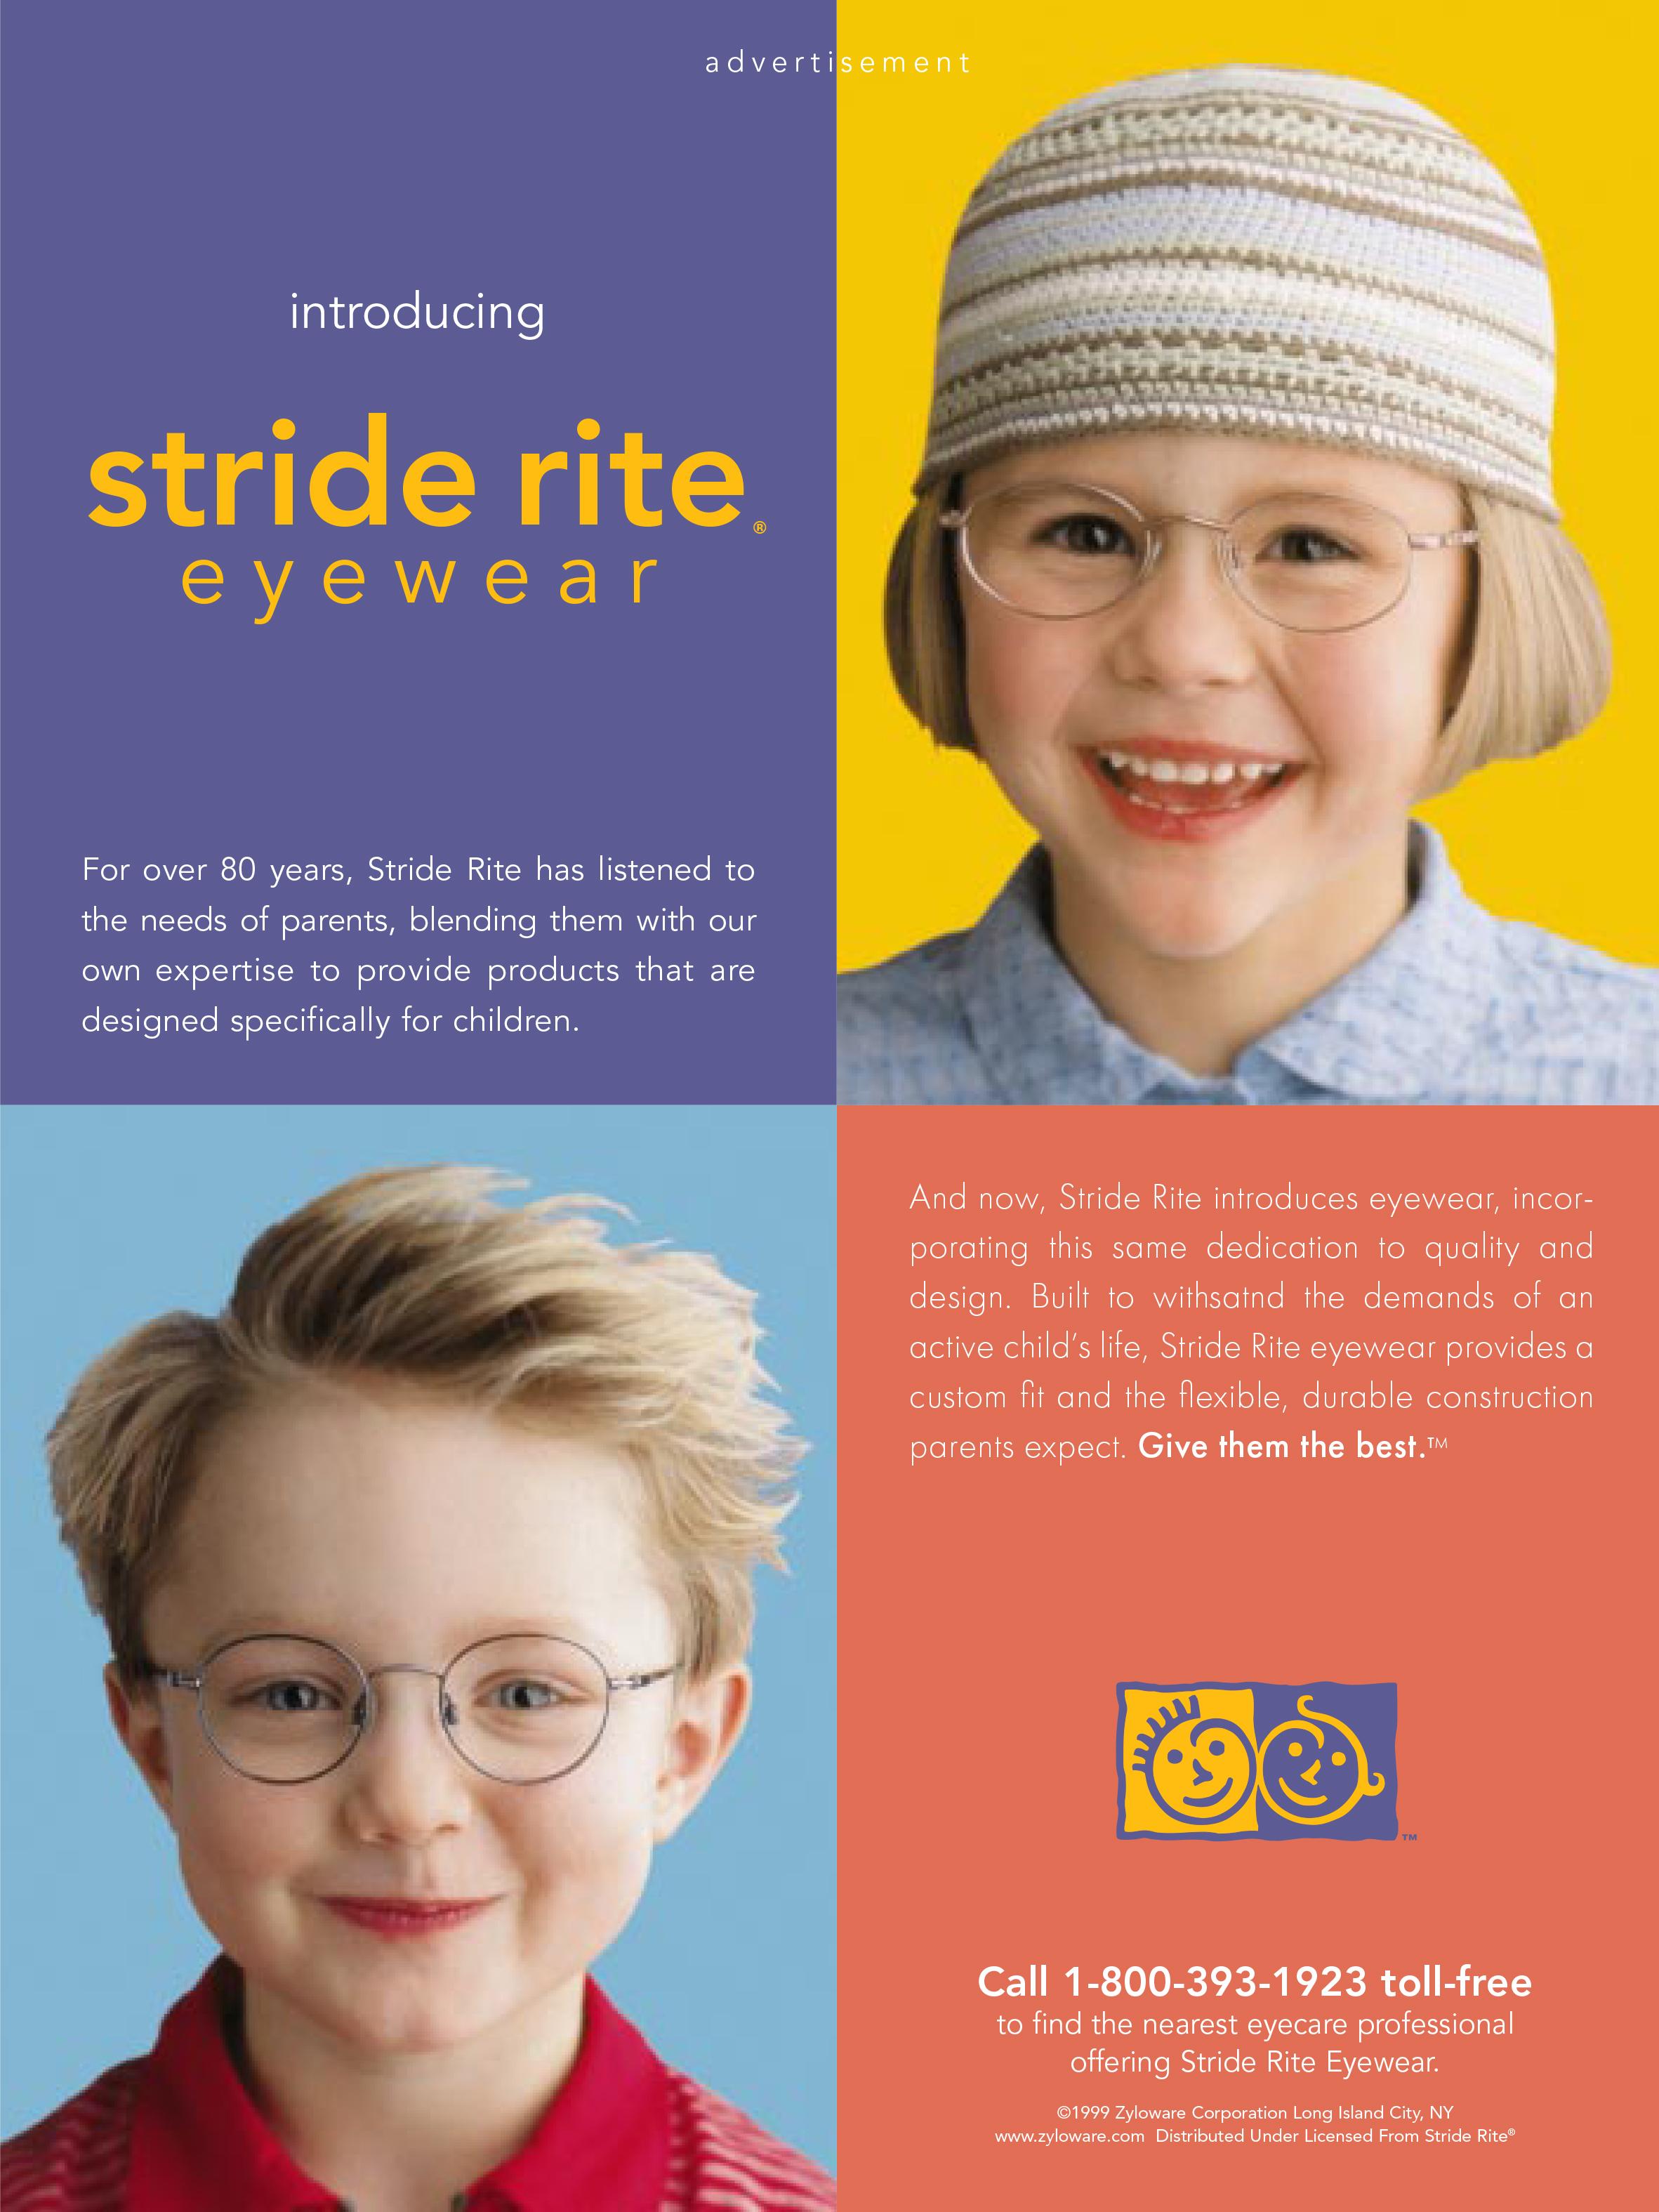 SReyewear ad.jpg